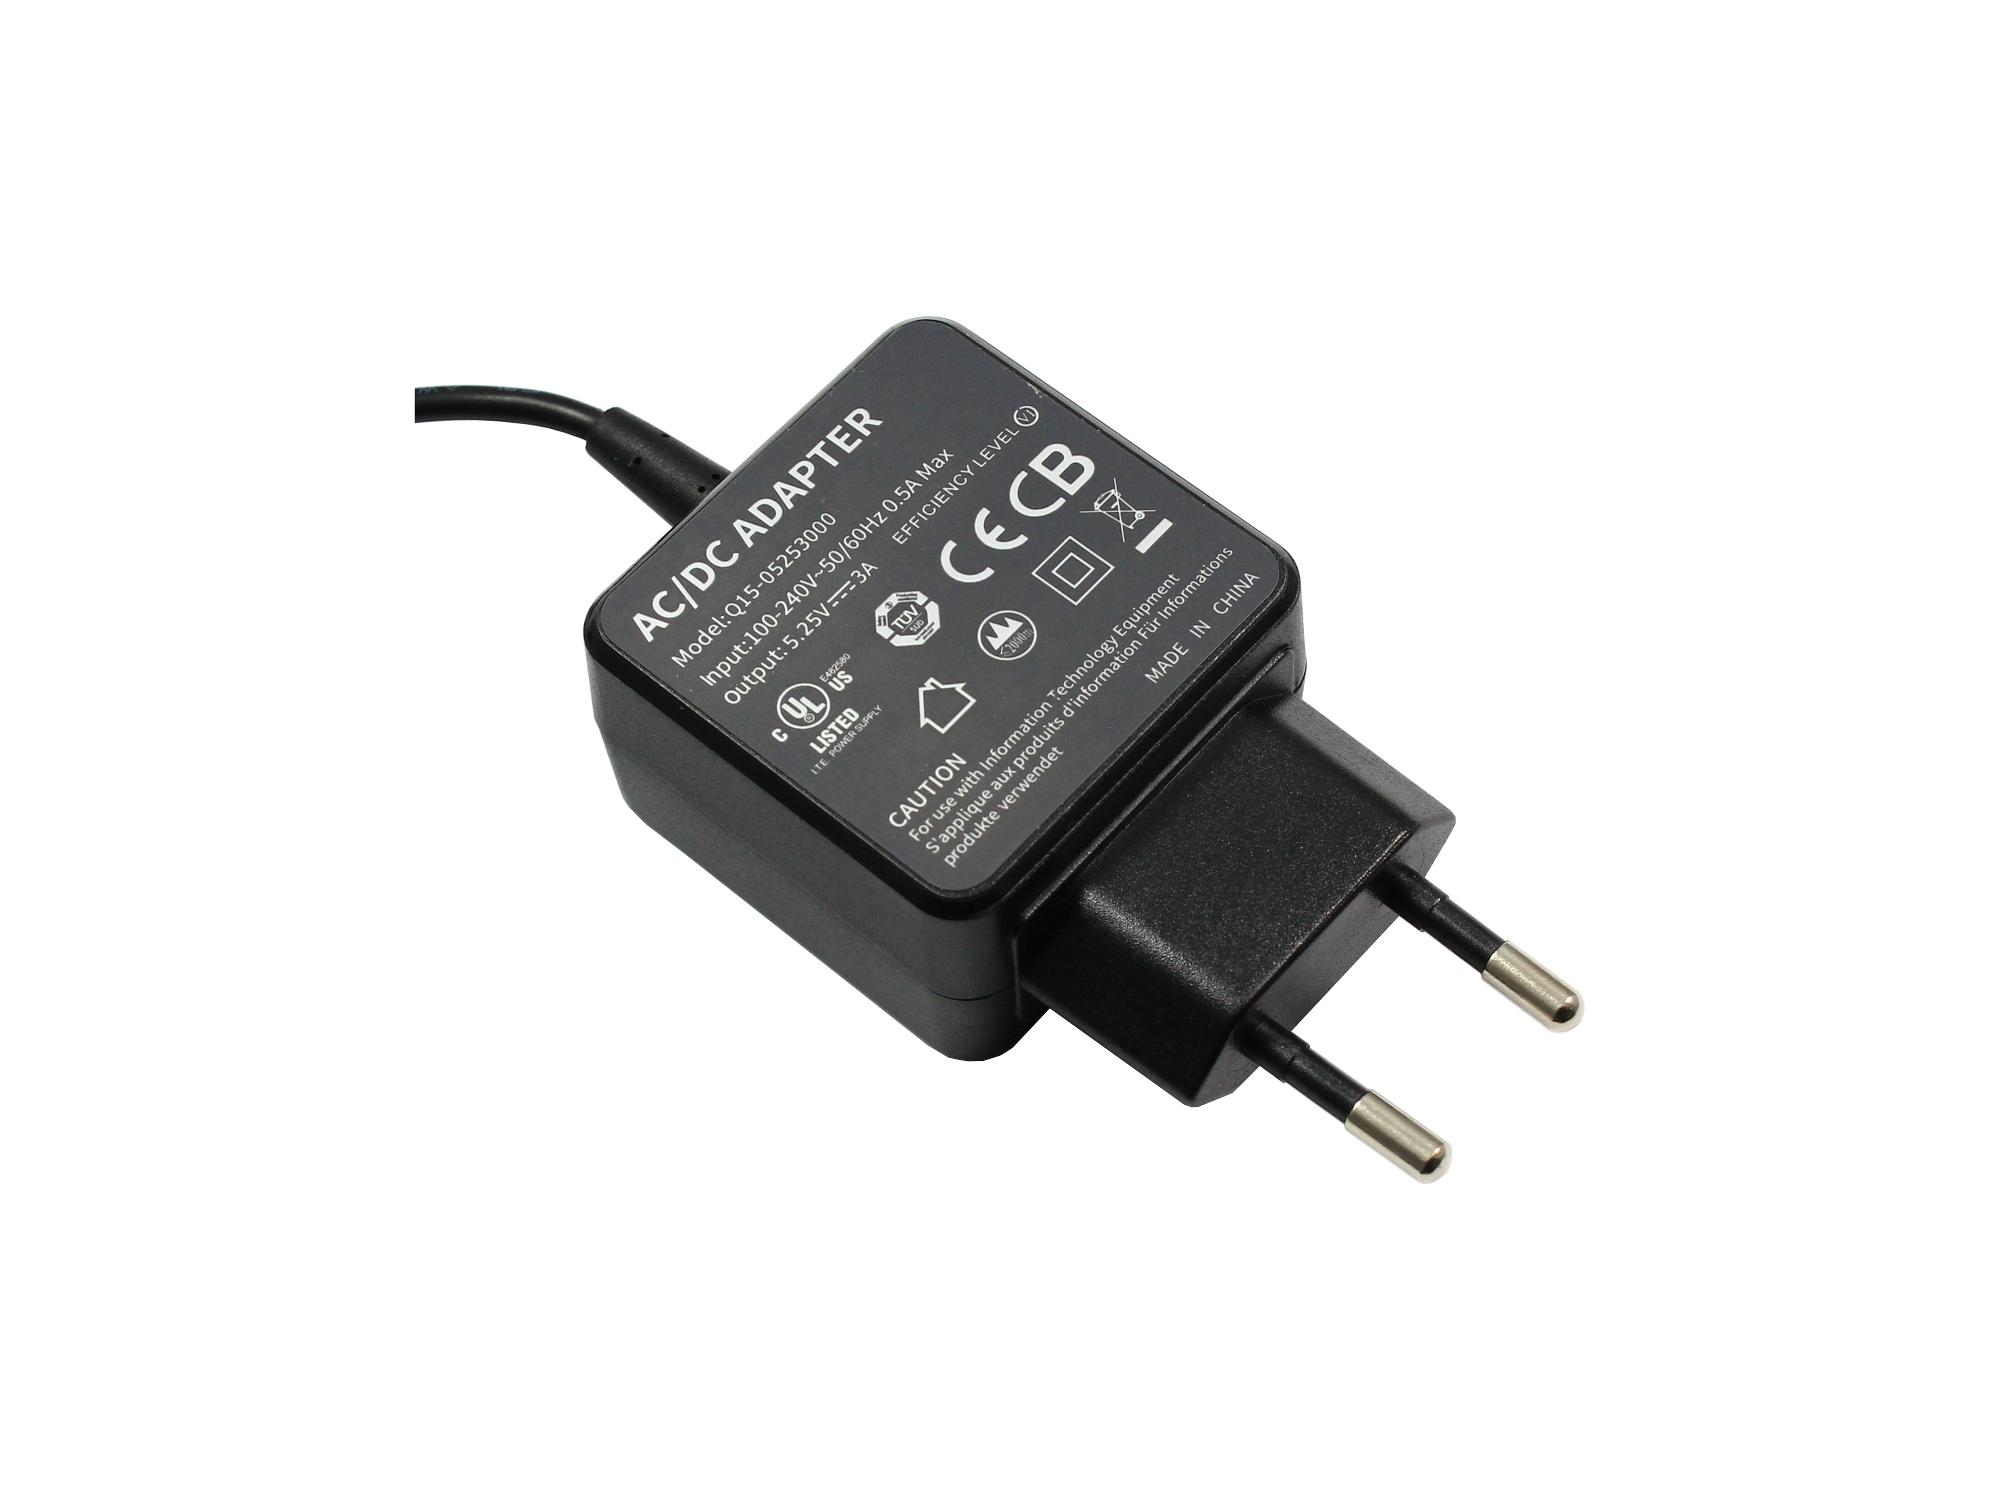 Incarcator 5.25V 3A 15W Micro-USB pentru HP ChromeBook 11-2000 series